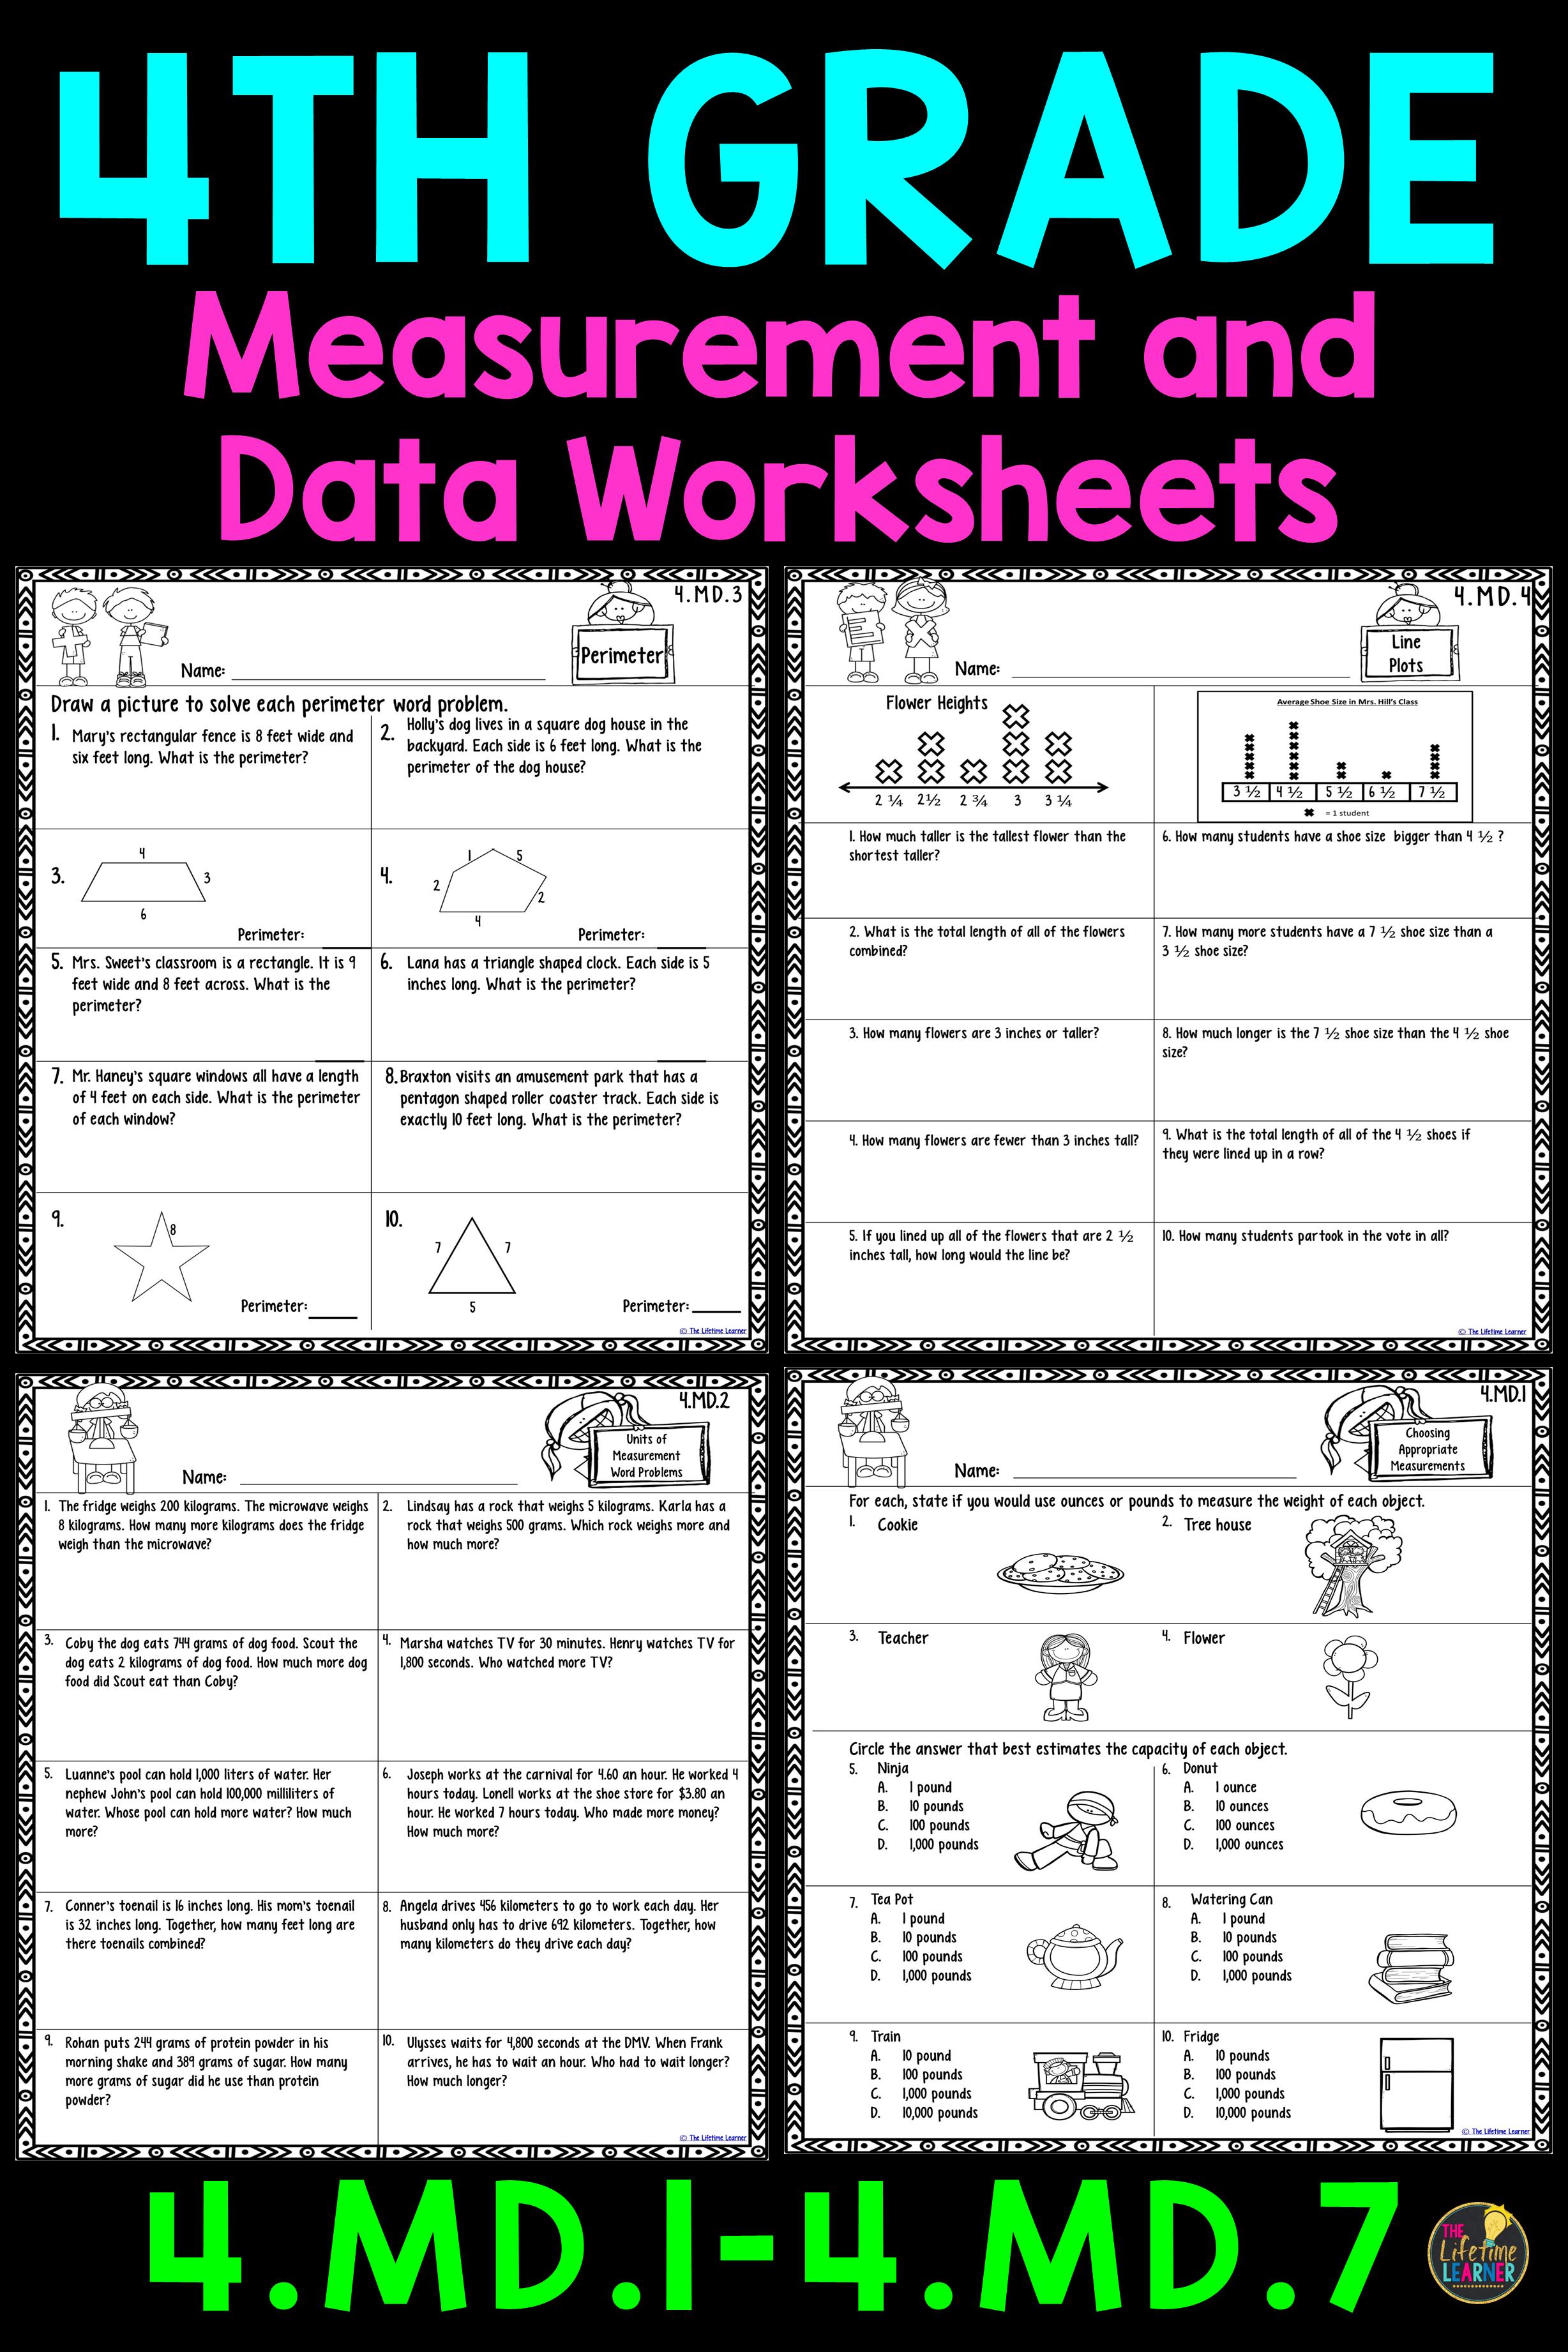 4th Grade Measurement and Data Worksheets | 4th grade math ...